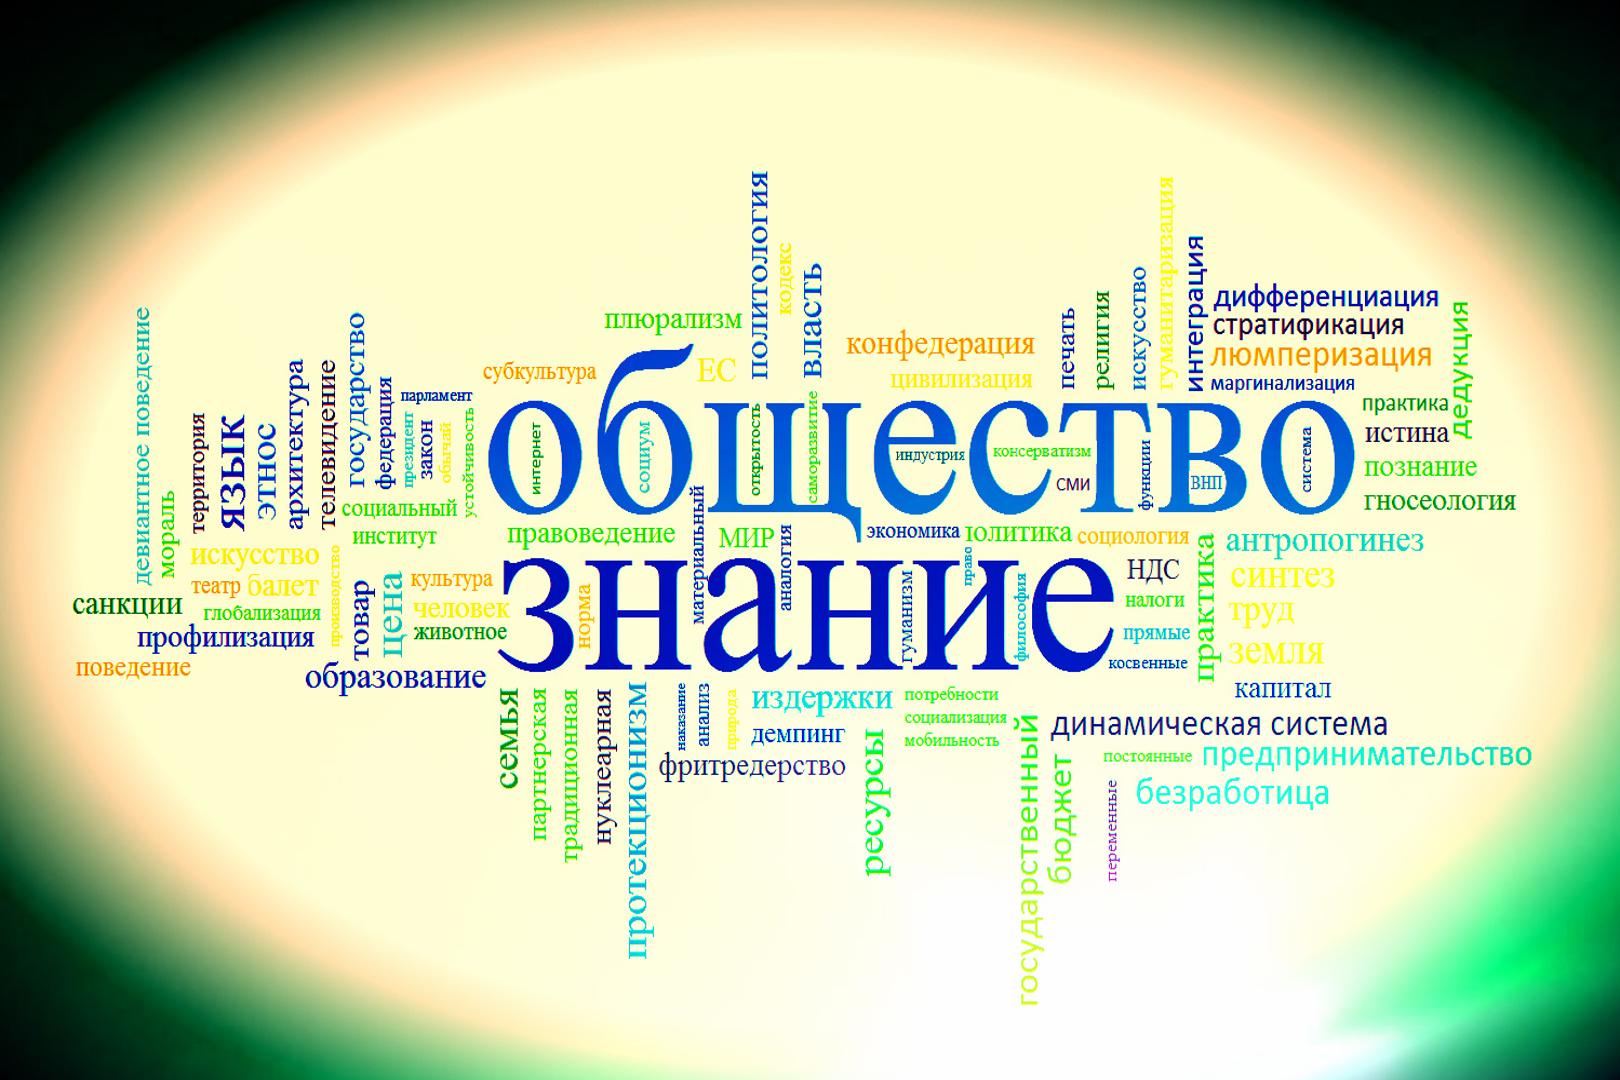 Слово обществознание на фоне других слов